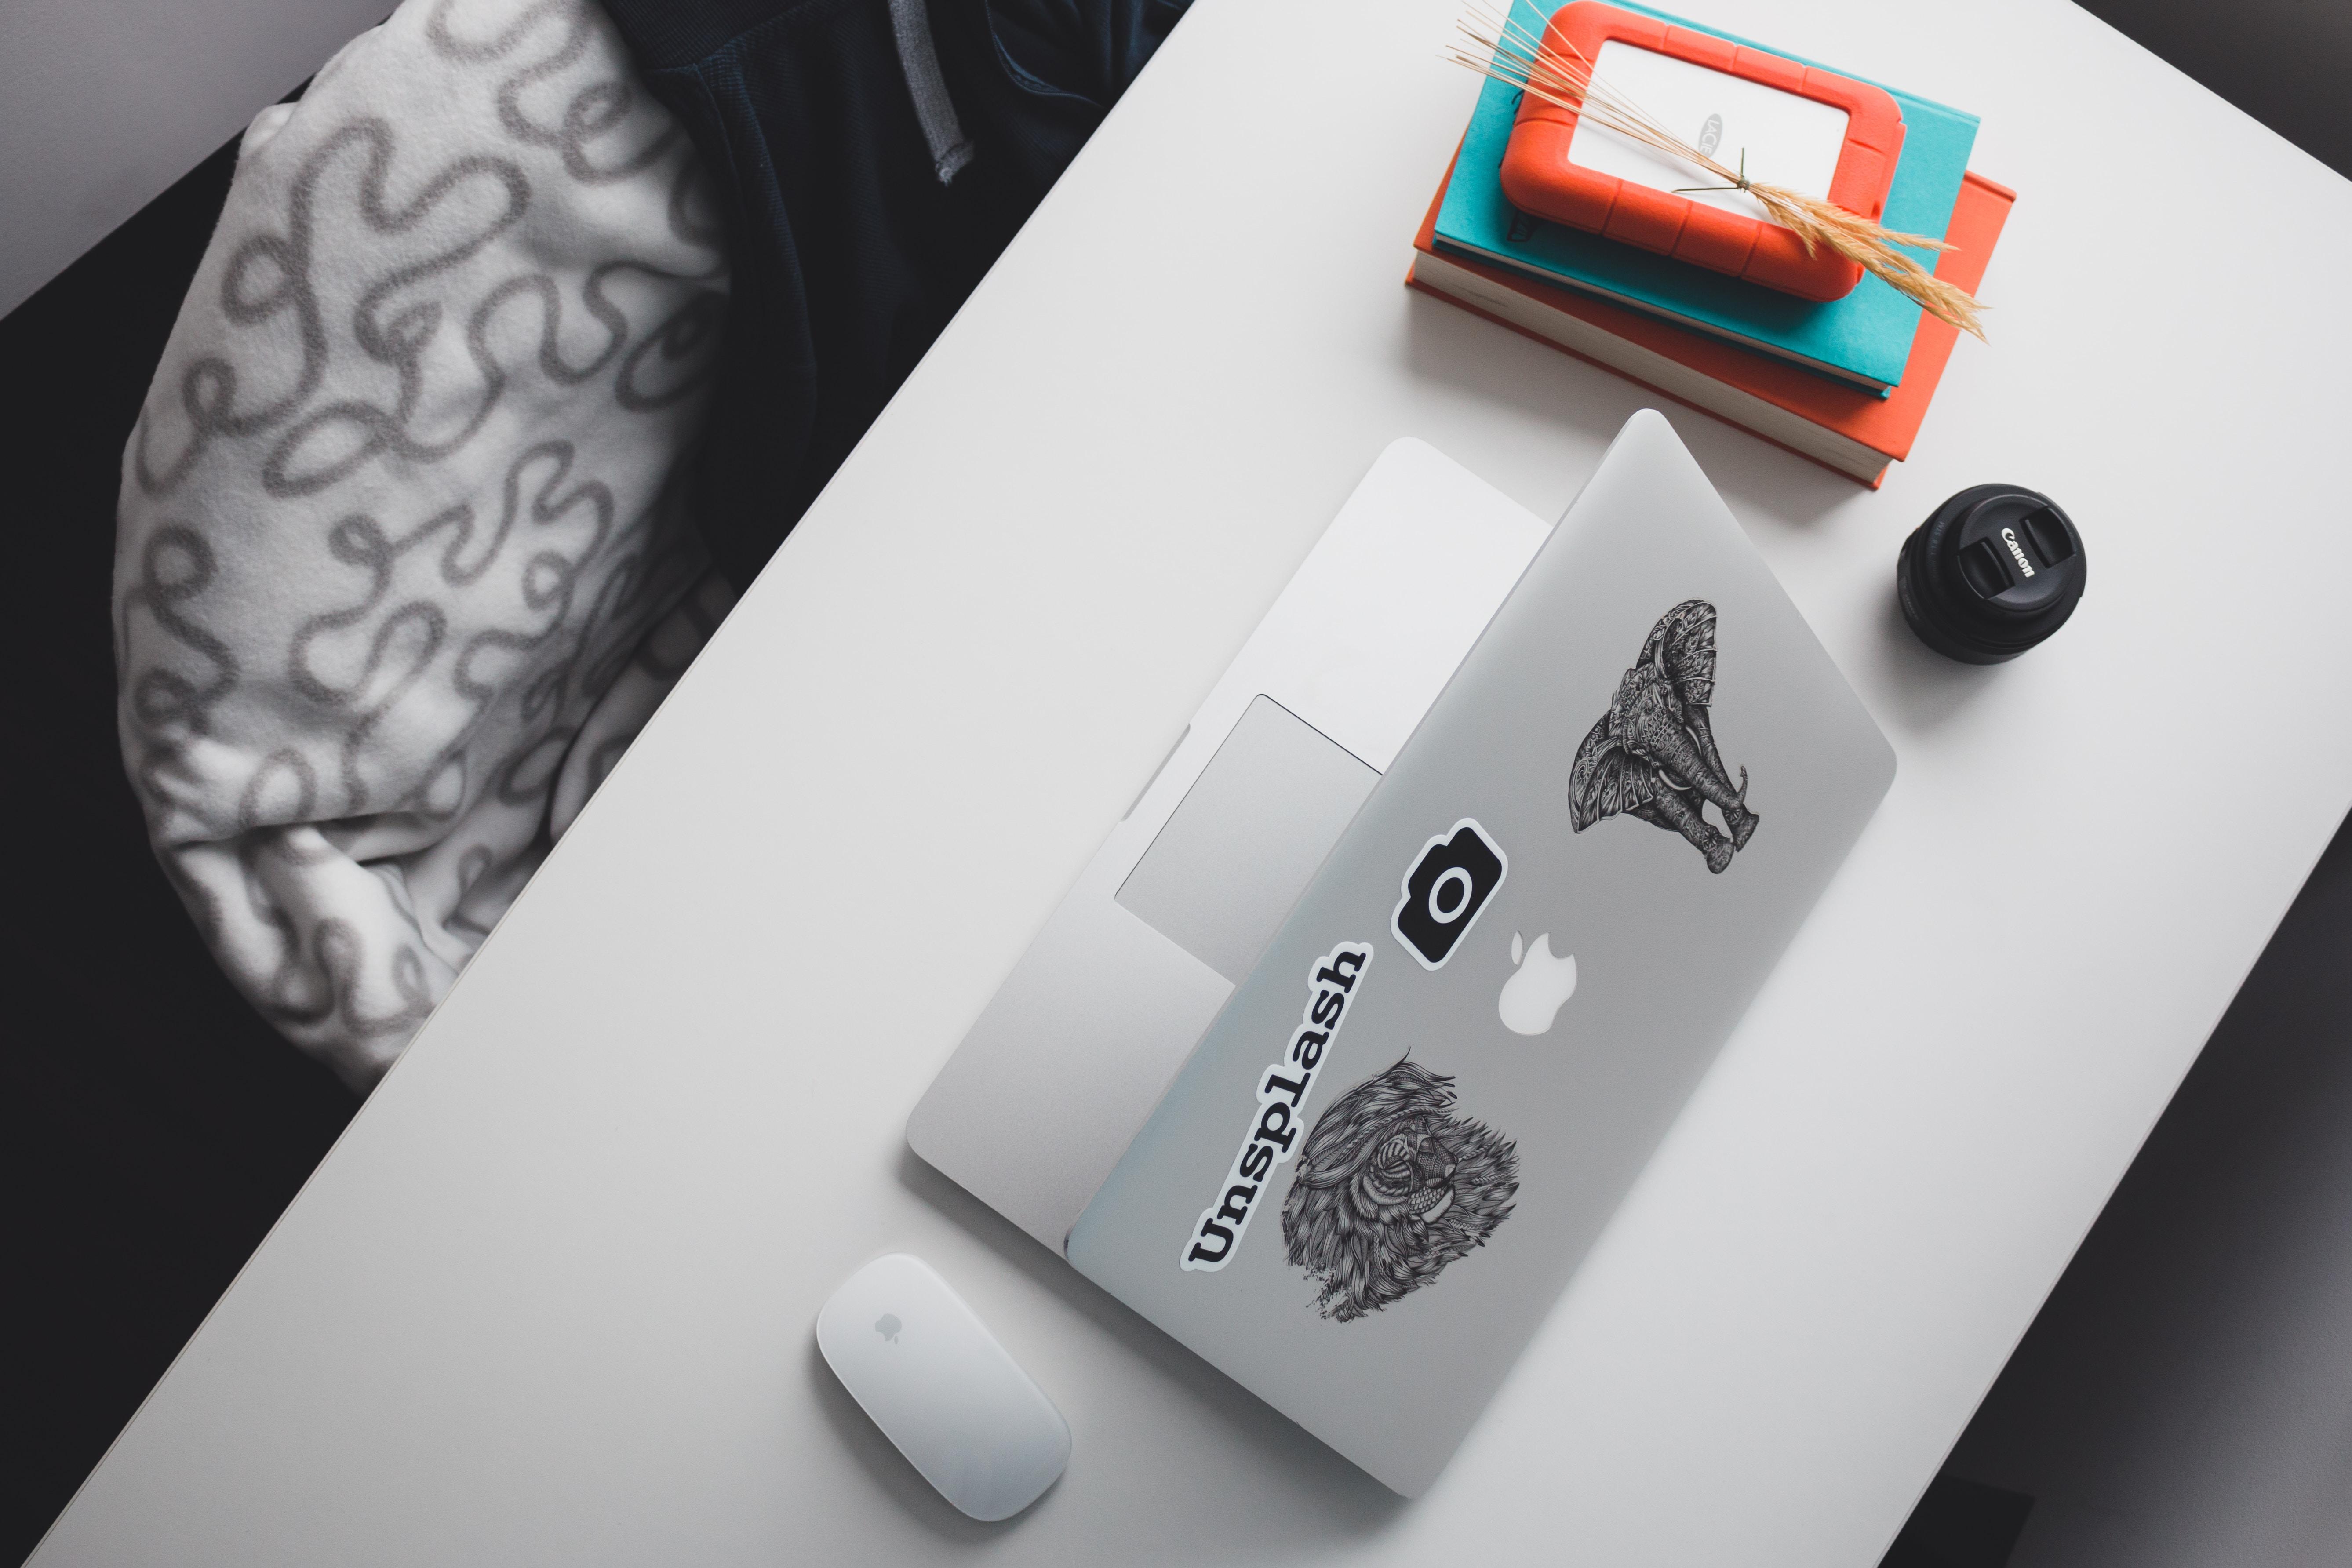 opened silver MacBook